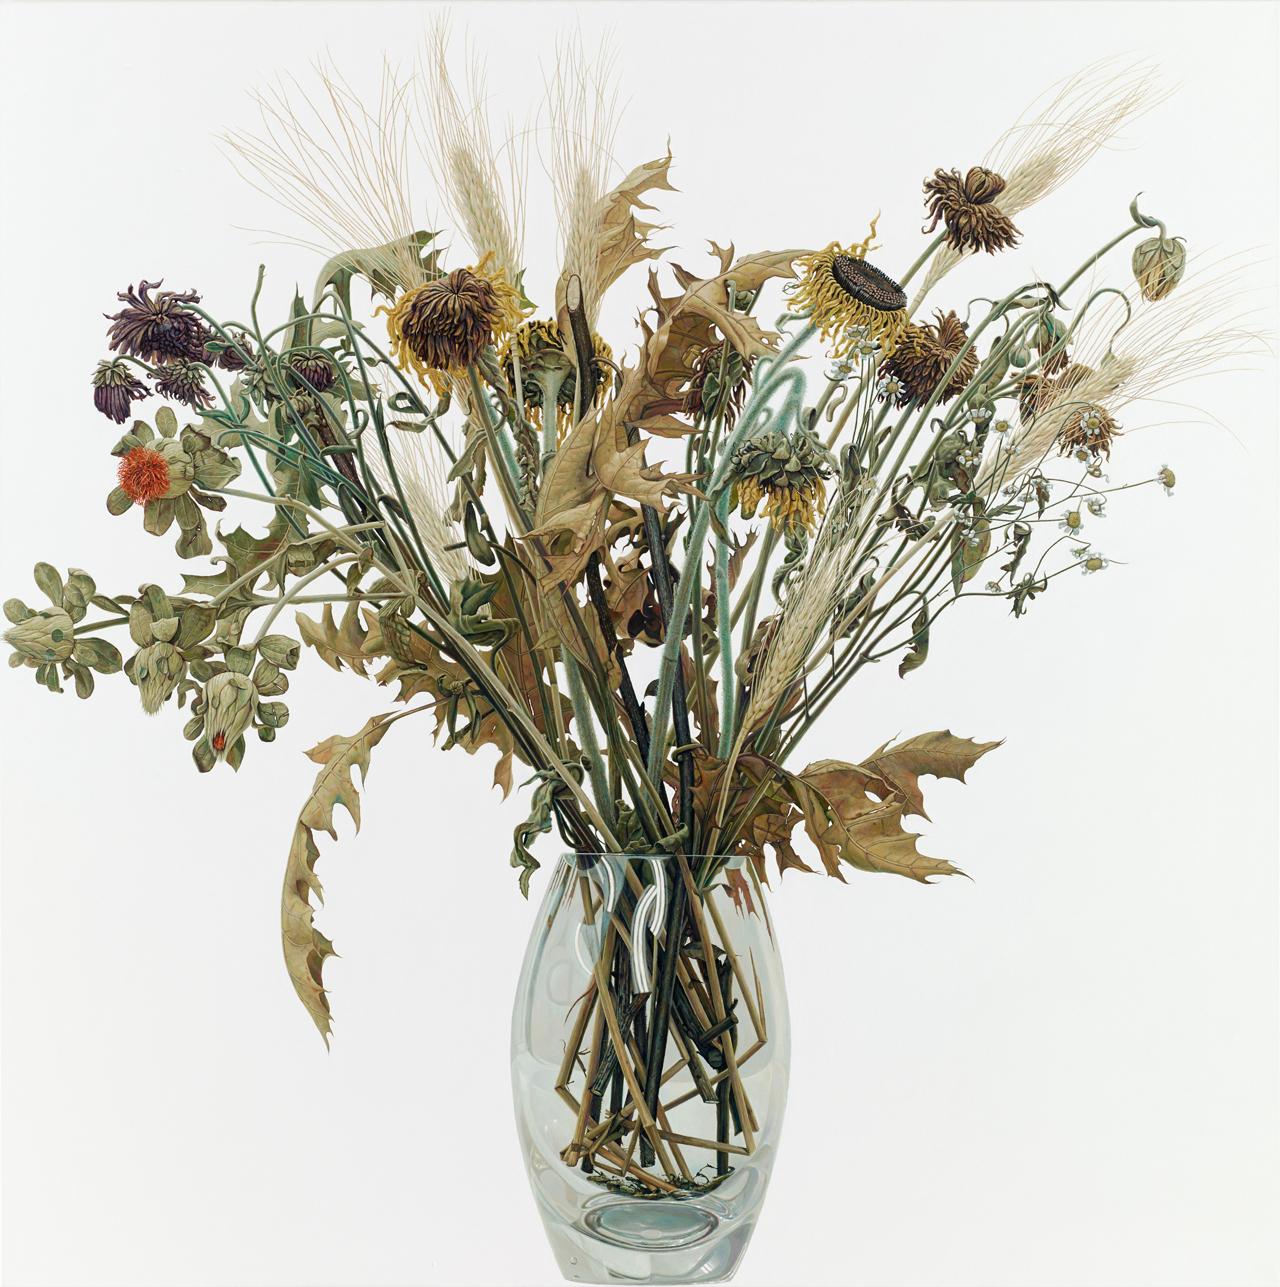 René Wirths, Bouquet, 2013, Öl auf Leinwand, 200 x 200 cm